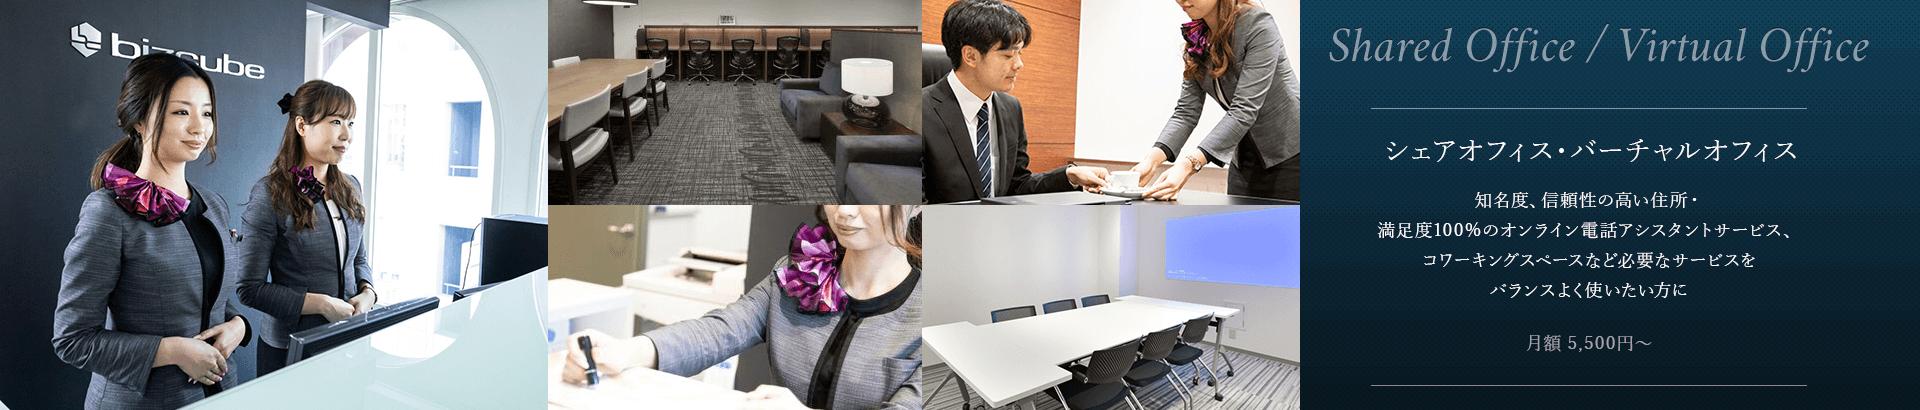 Share Office / Virtual Office シェアオフィス・バーチャルオフィス